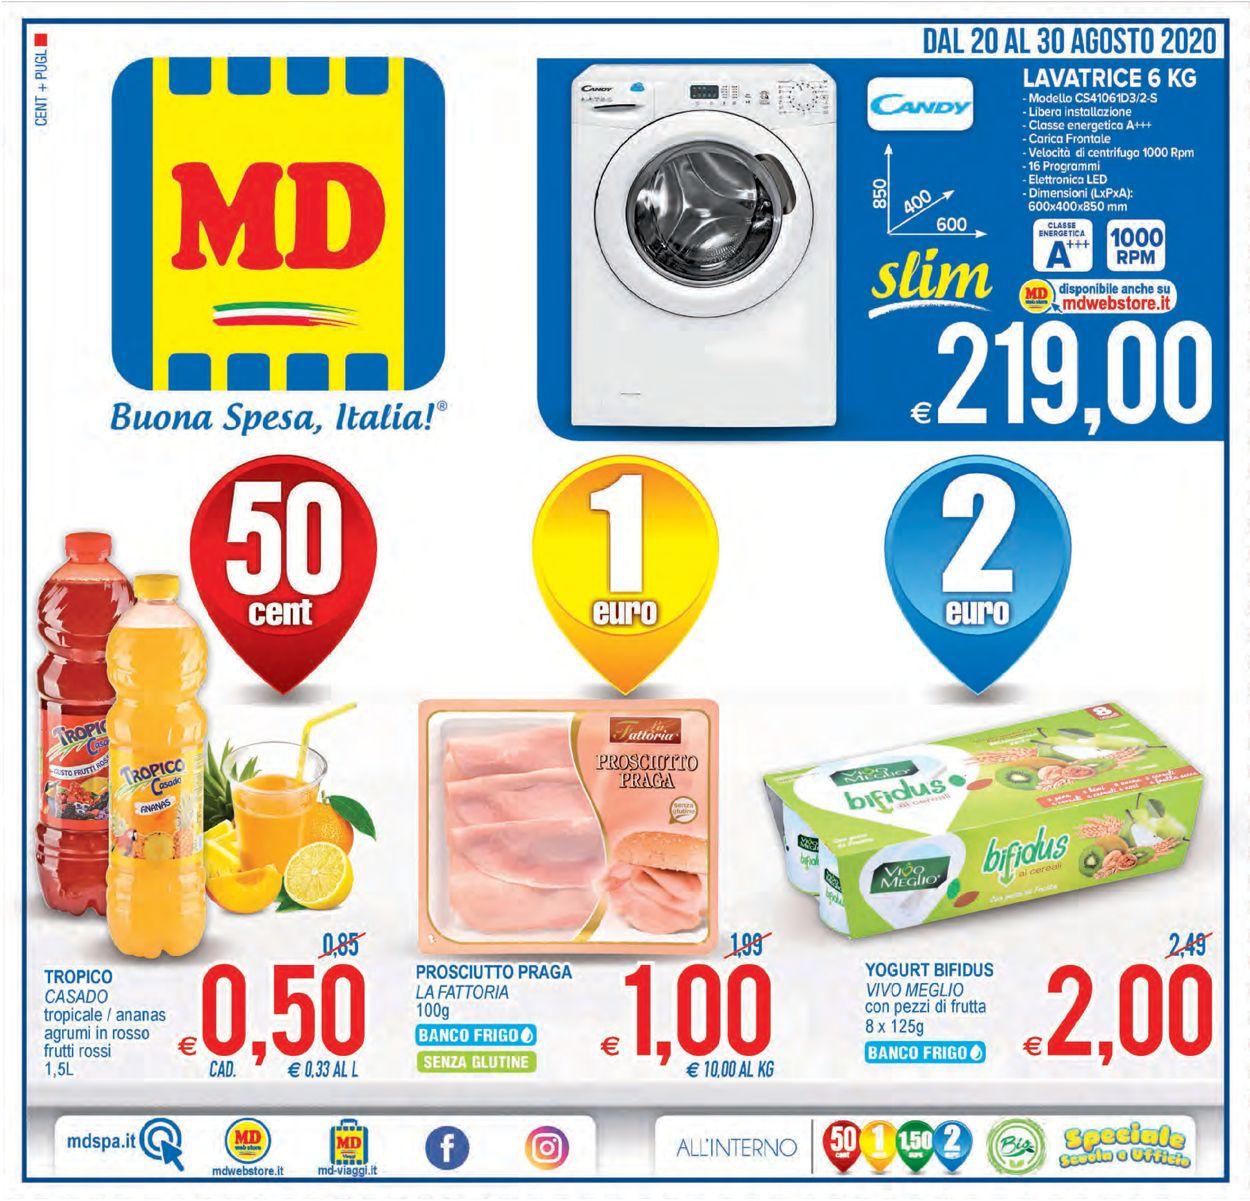 Volantino MD Discount - Offerte 20/08-30/08/2020